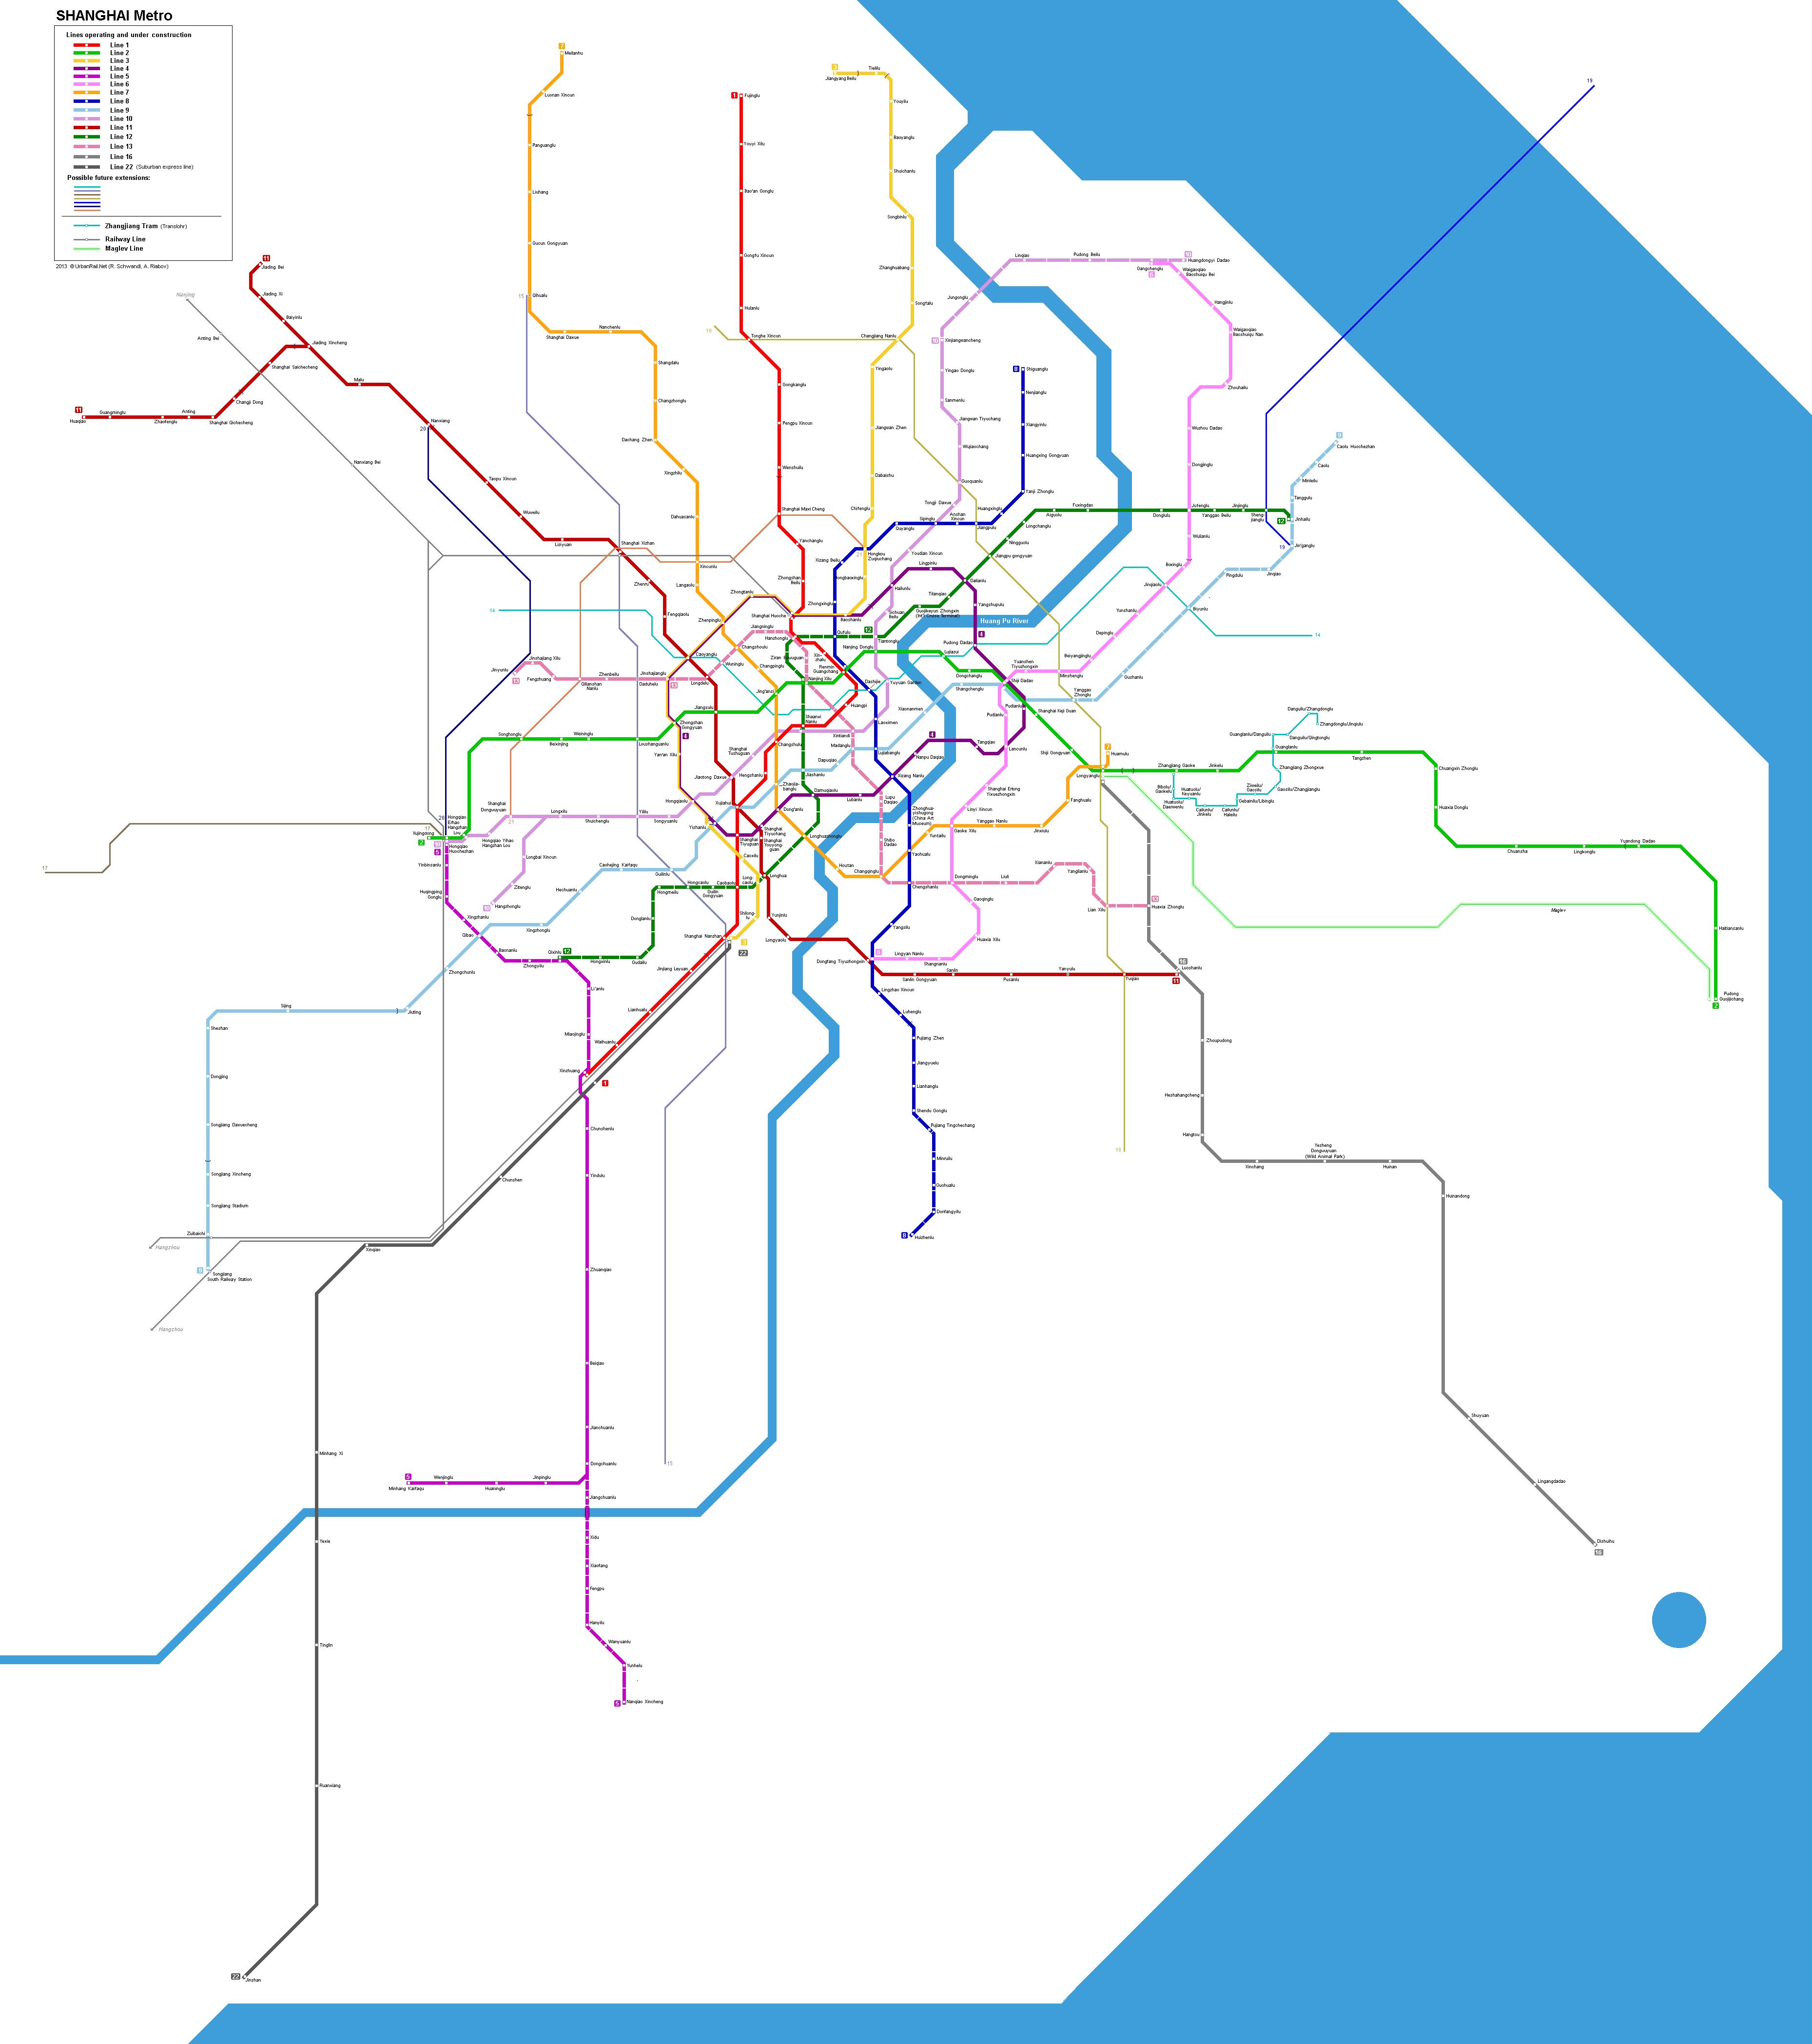 shanghai-full-map.png